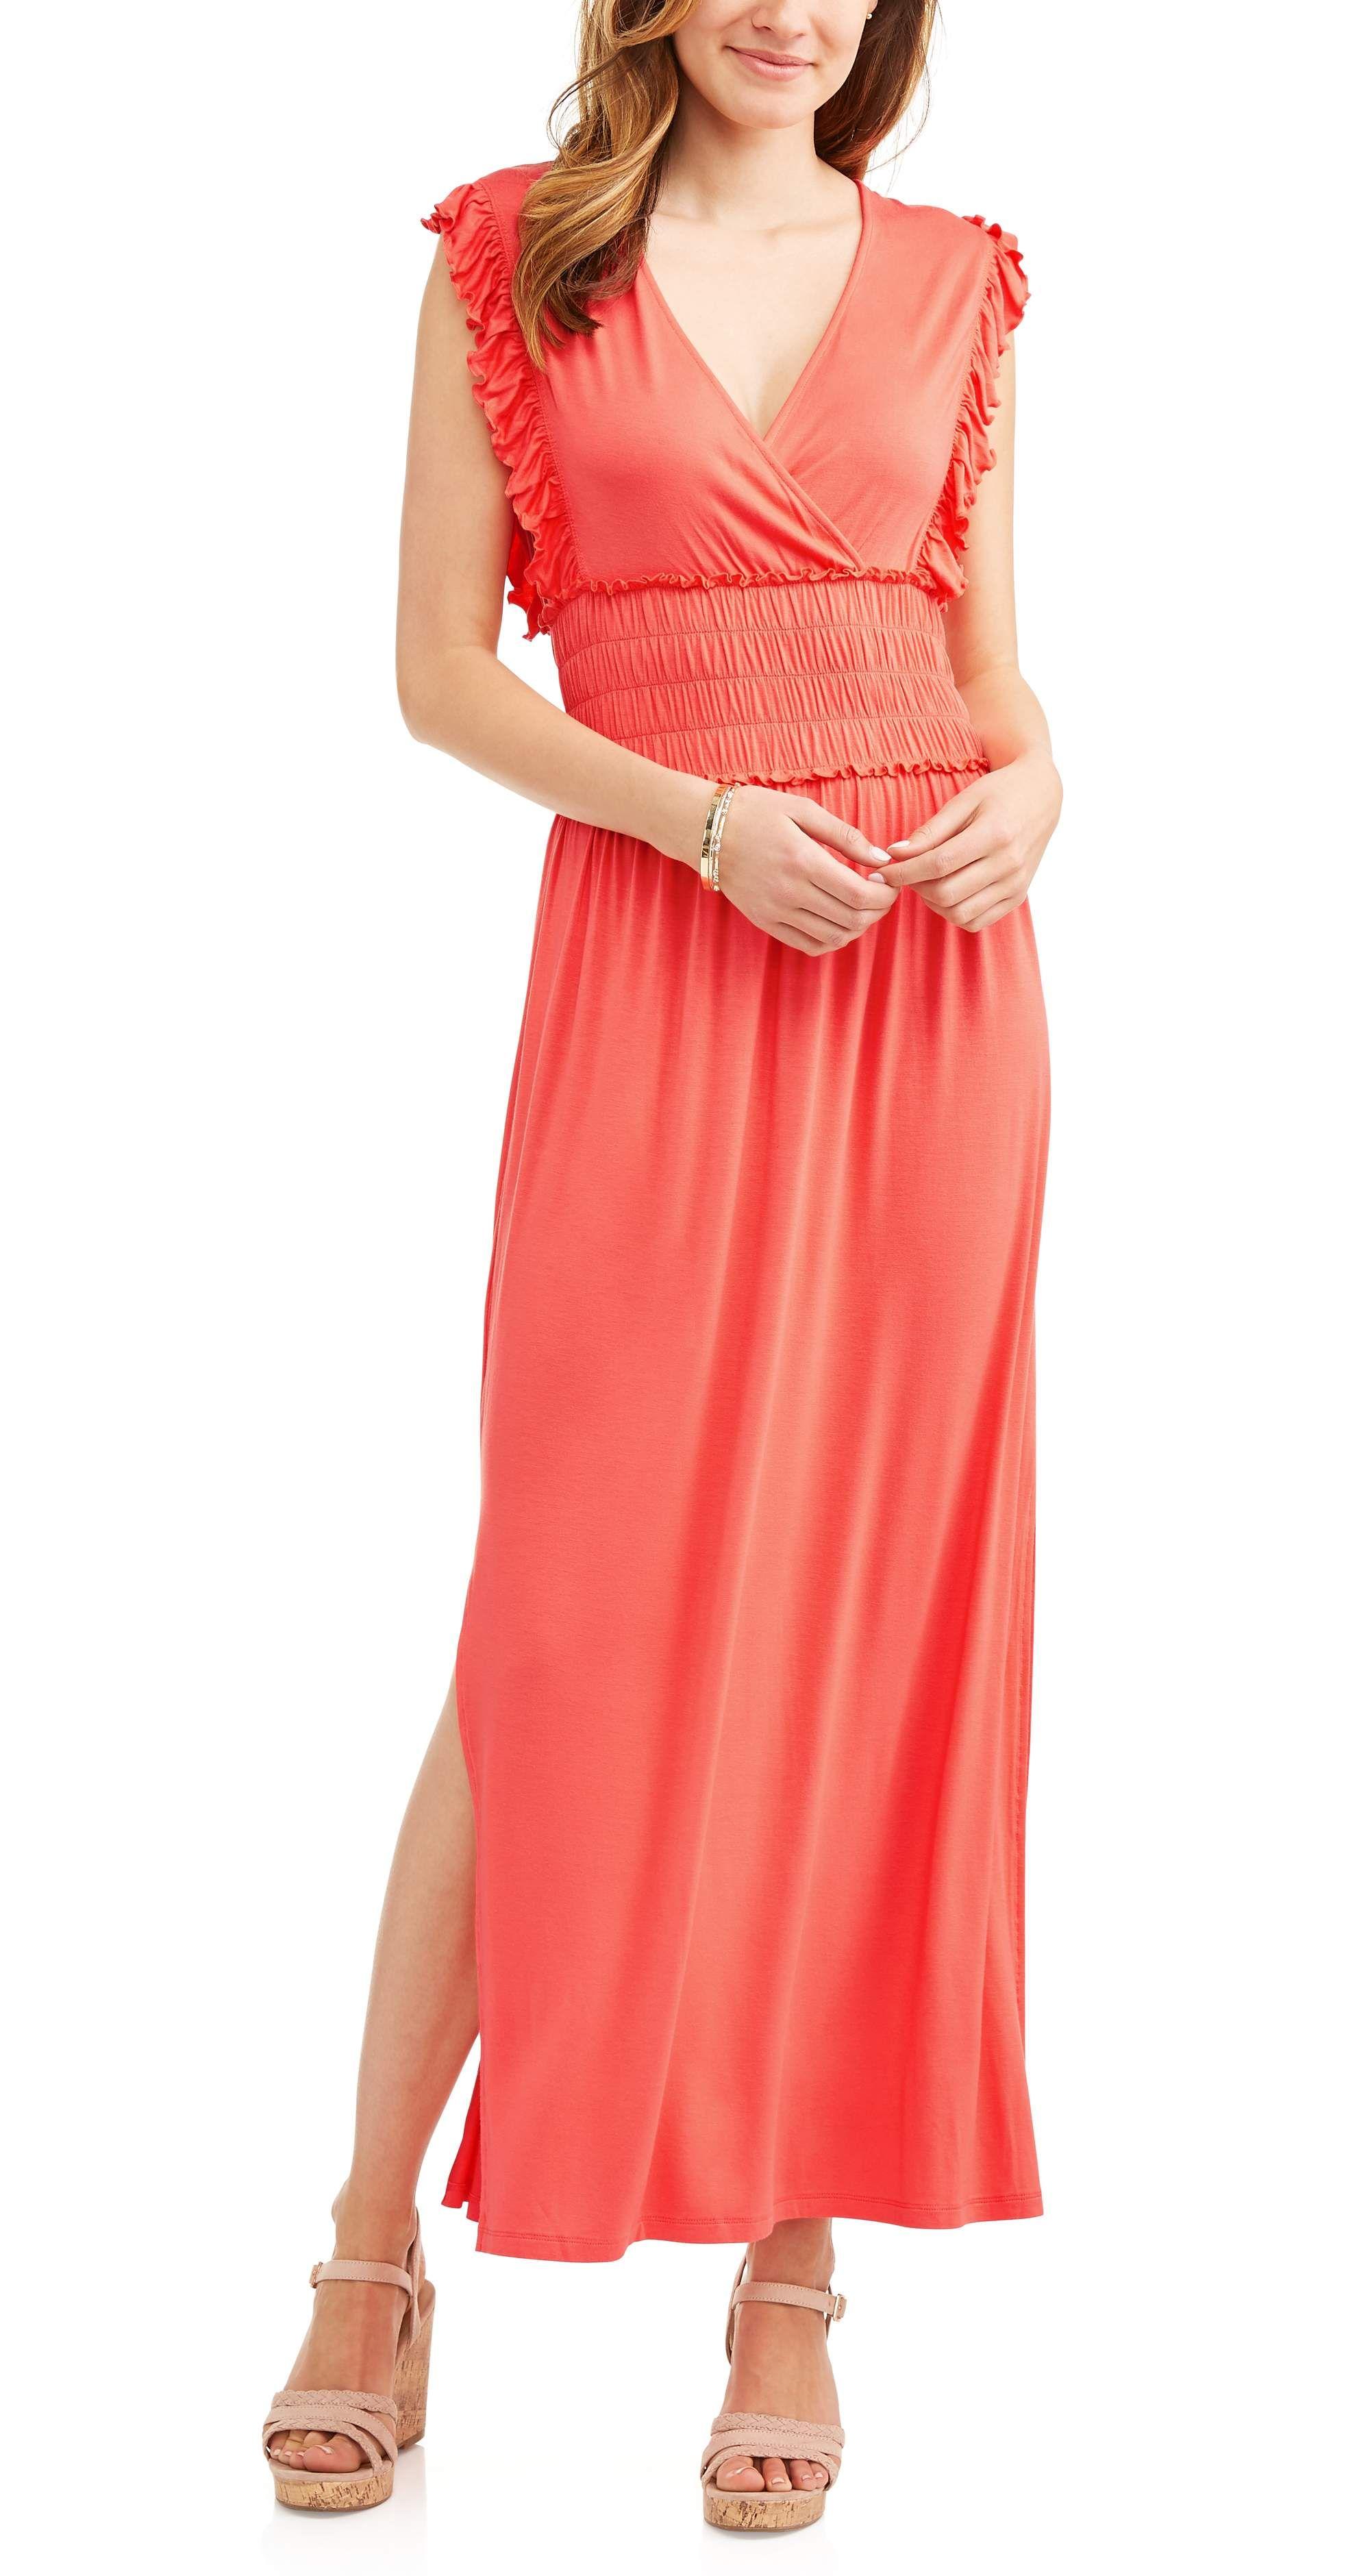 Women S Wrap Dress Walmart Com Womens Wrap Dress Maxi Dress Dresses [ 3760 x 2000 Pixel ]